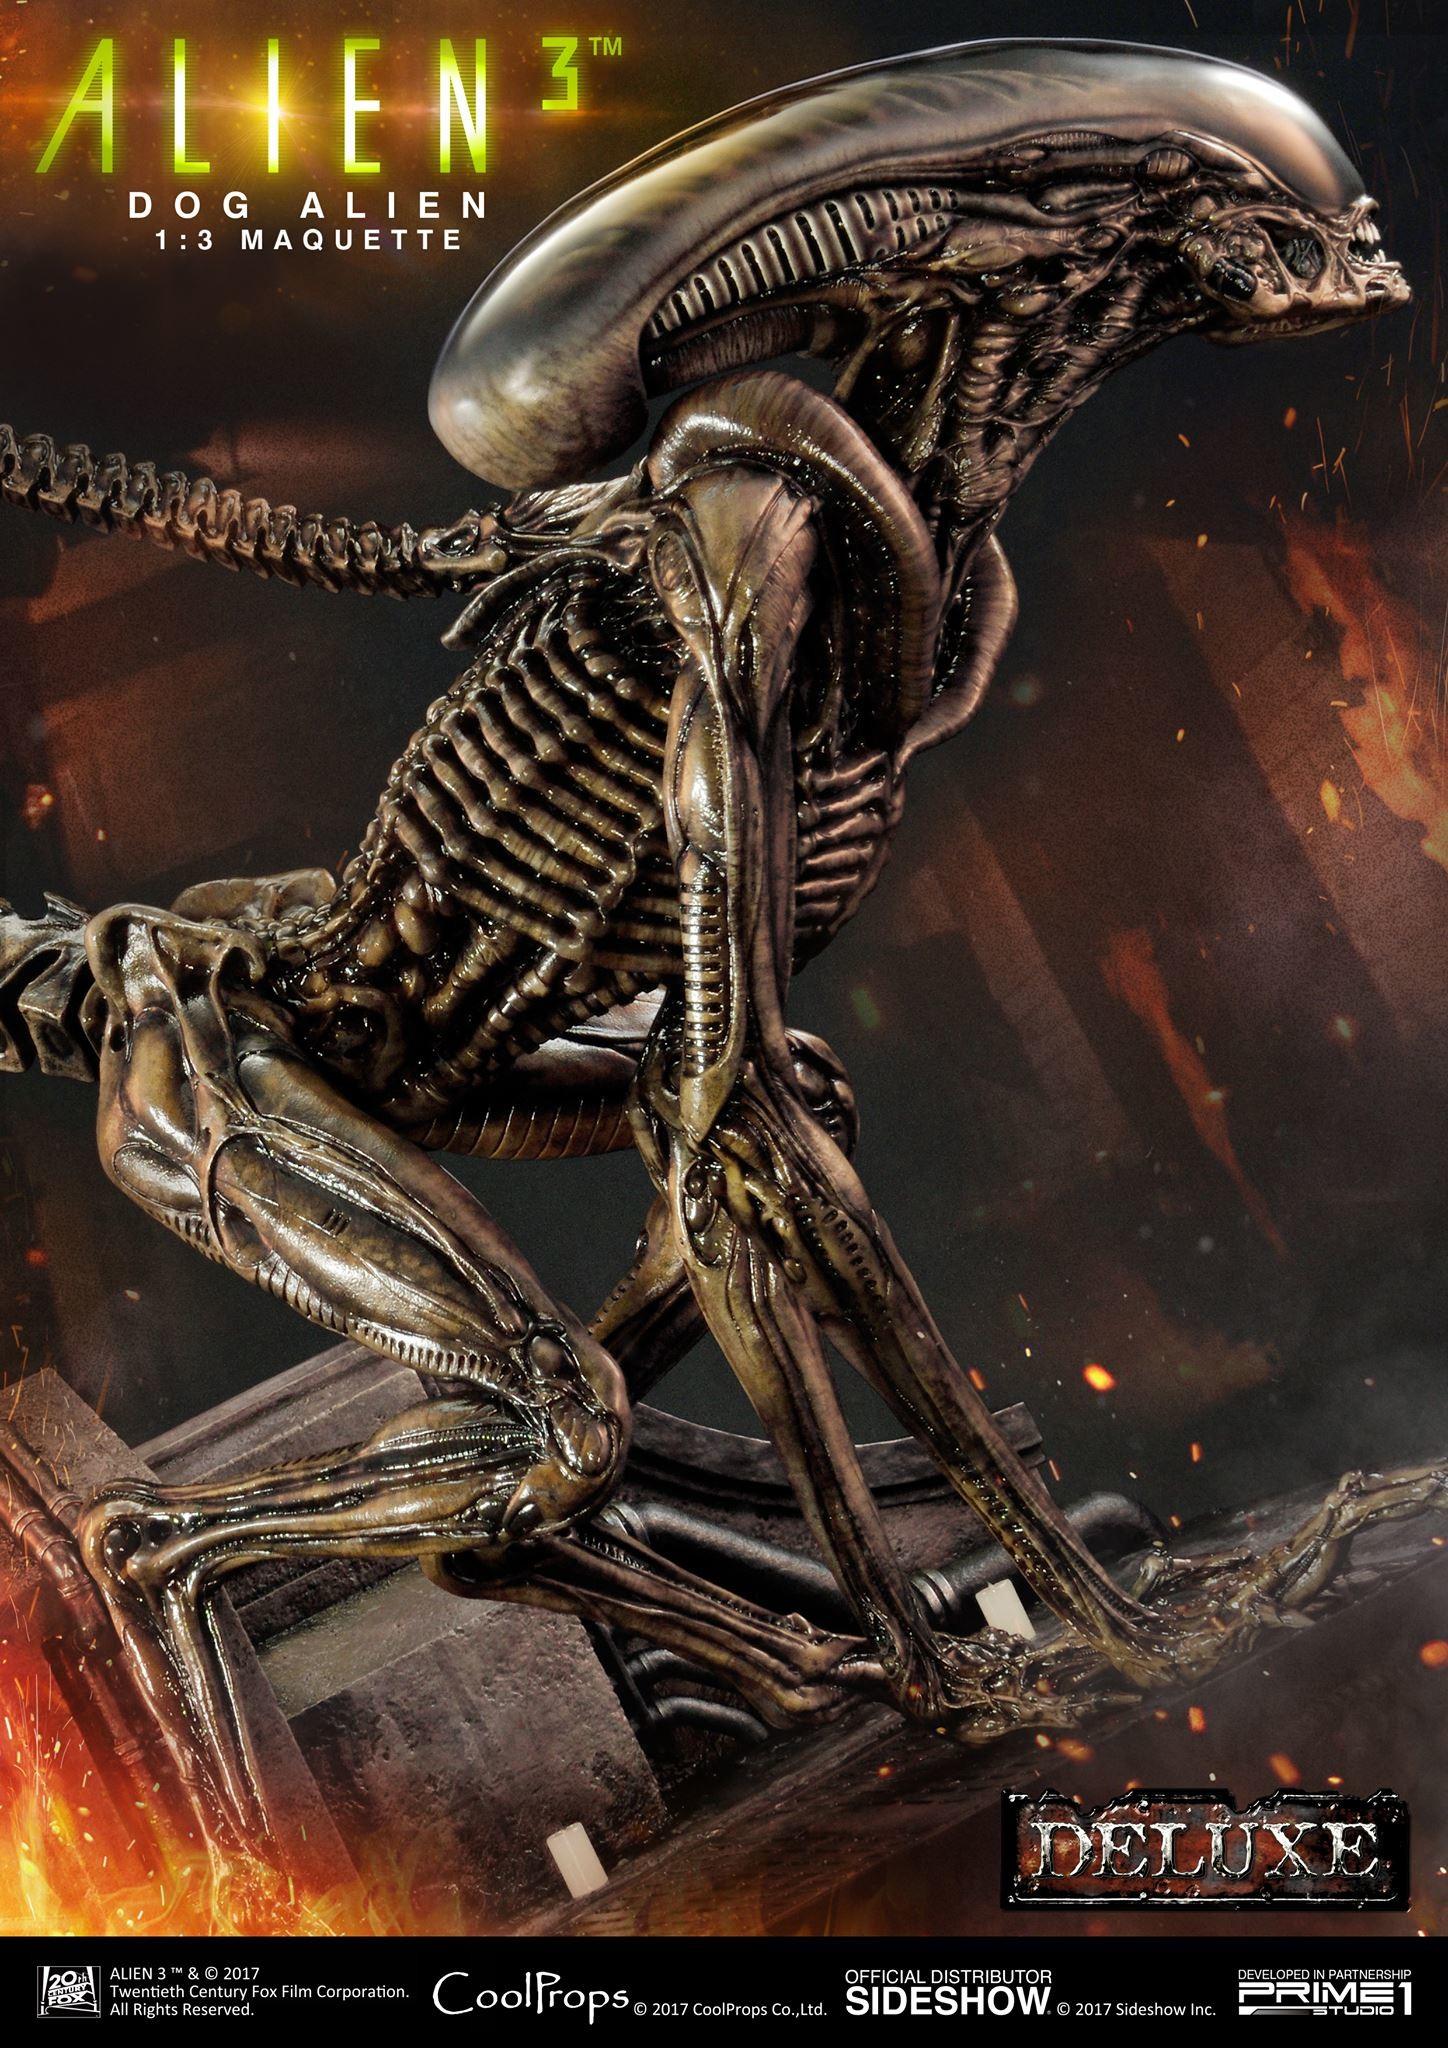 Abner marin alien 3 dog alien maquette 002